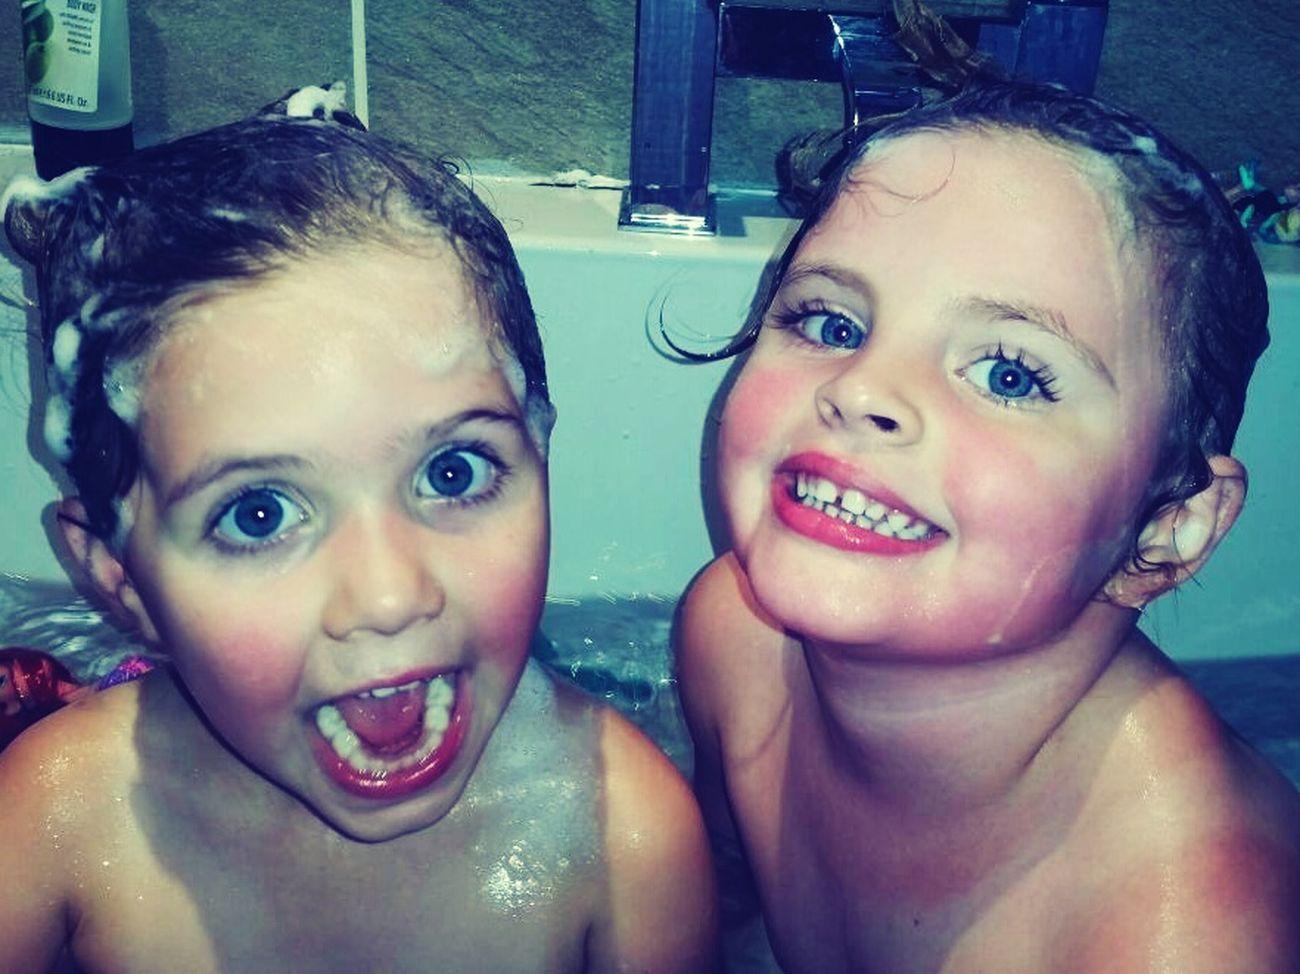 People Together Cheese! Enjoying Life Bathtub Cousins ❤ Cousinsareawesome Littlegirls Happinessoverload Funtimeswithkids Bigeyesbigsmile Wet Hair